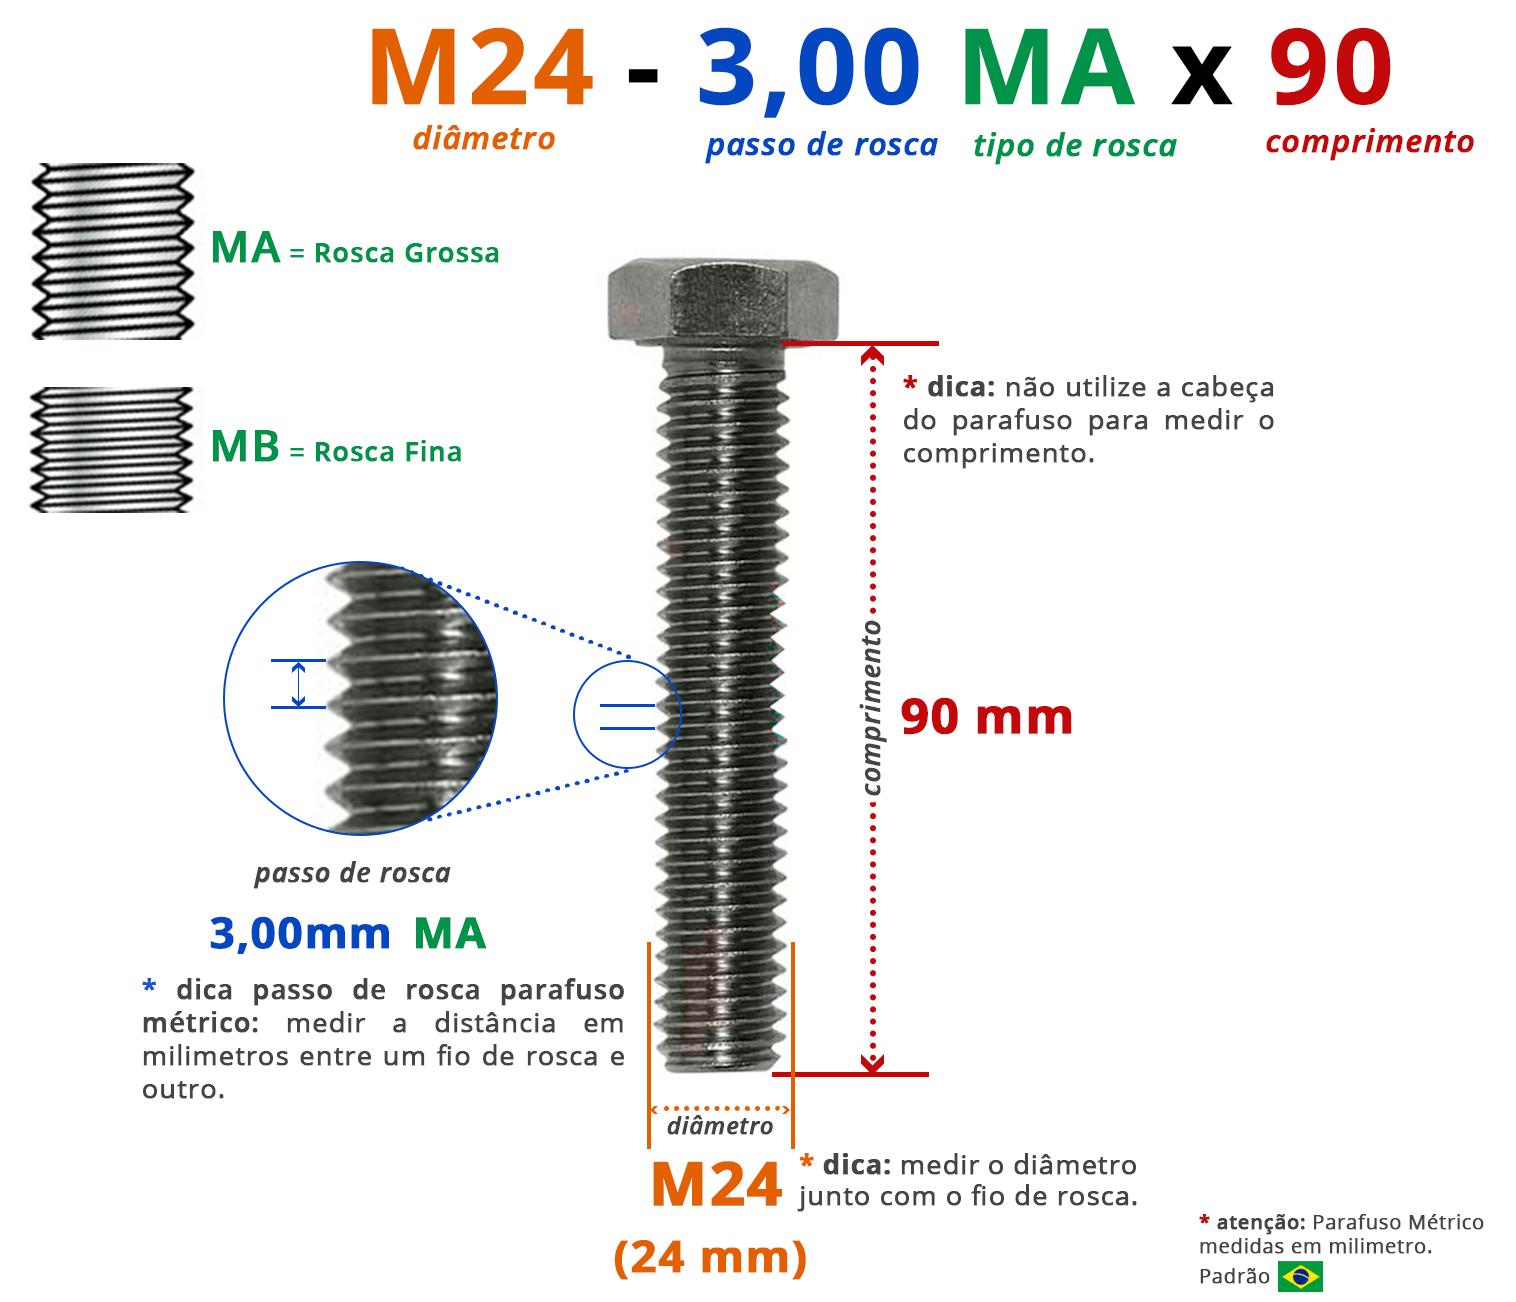 PARAFUSO SEXTAVADO ROSCA INTEIRA M24 3,00 MA X 90 DIN 933 INOX A4